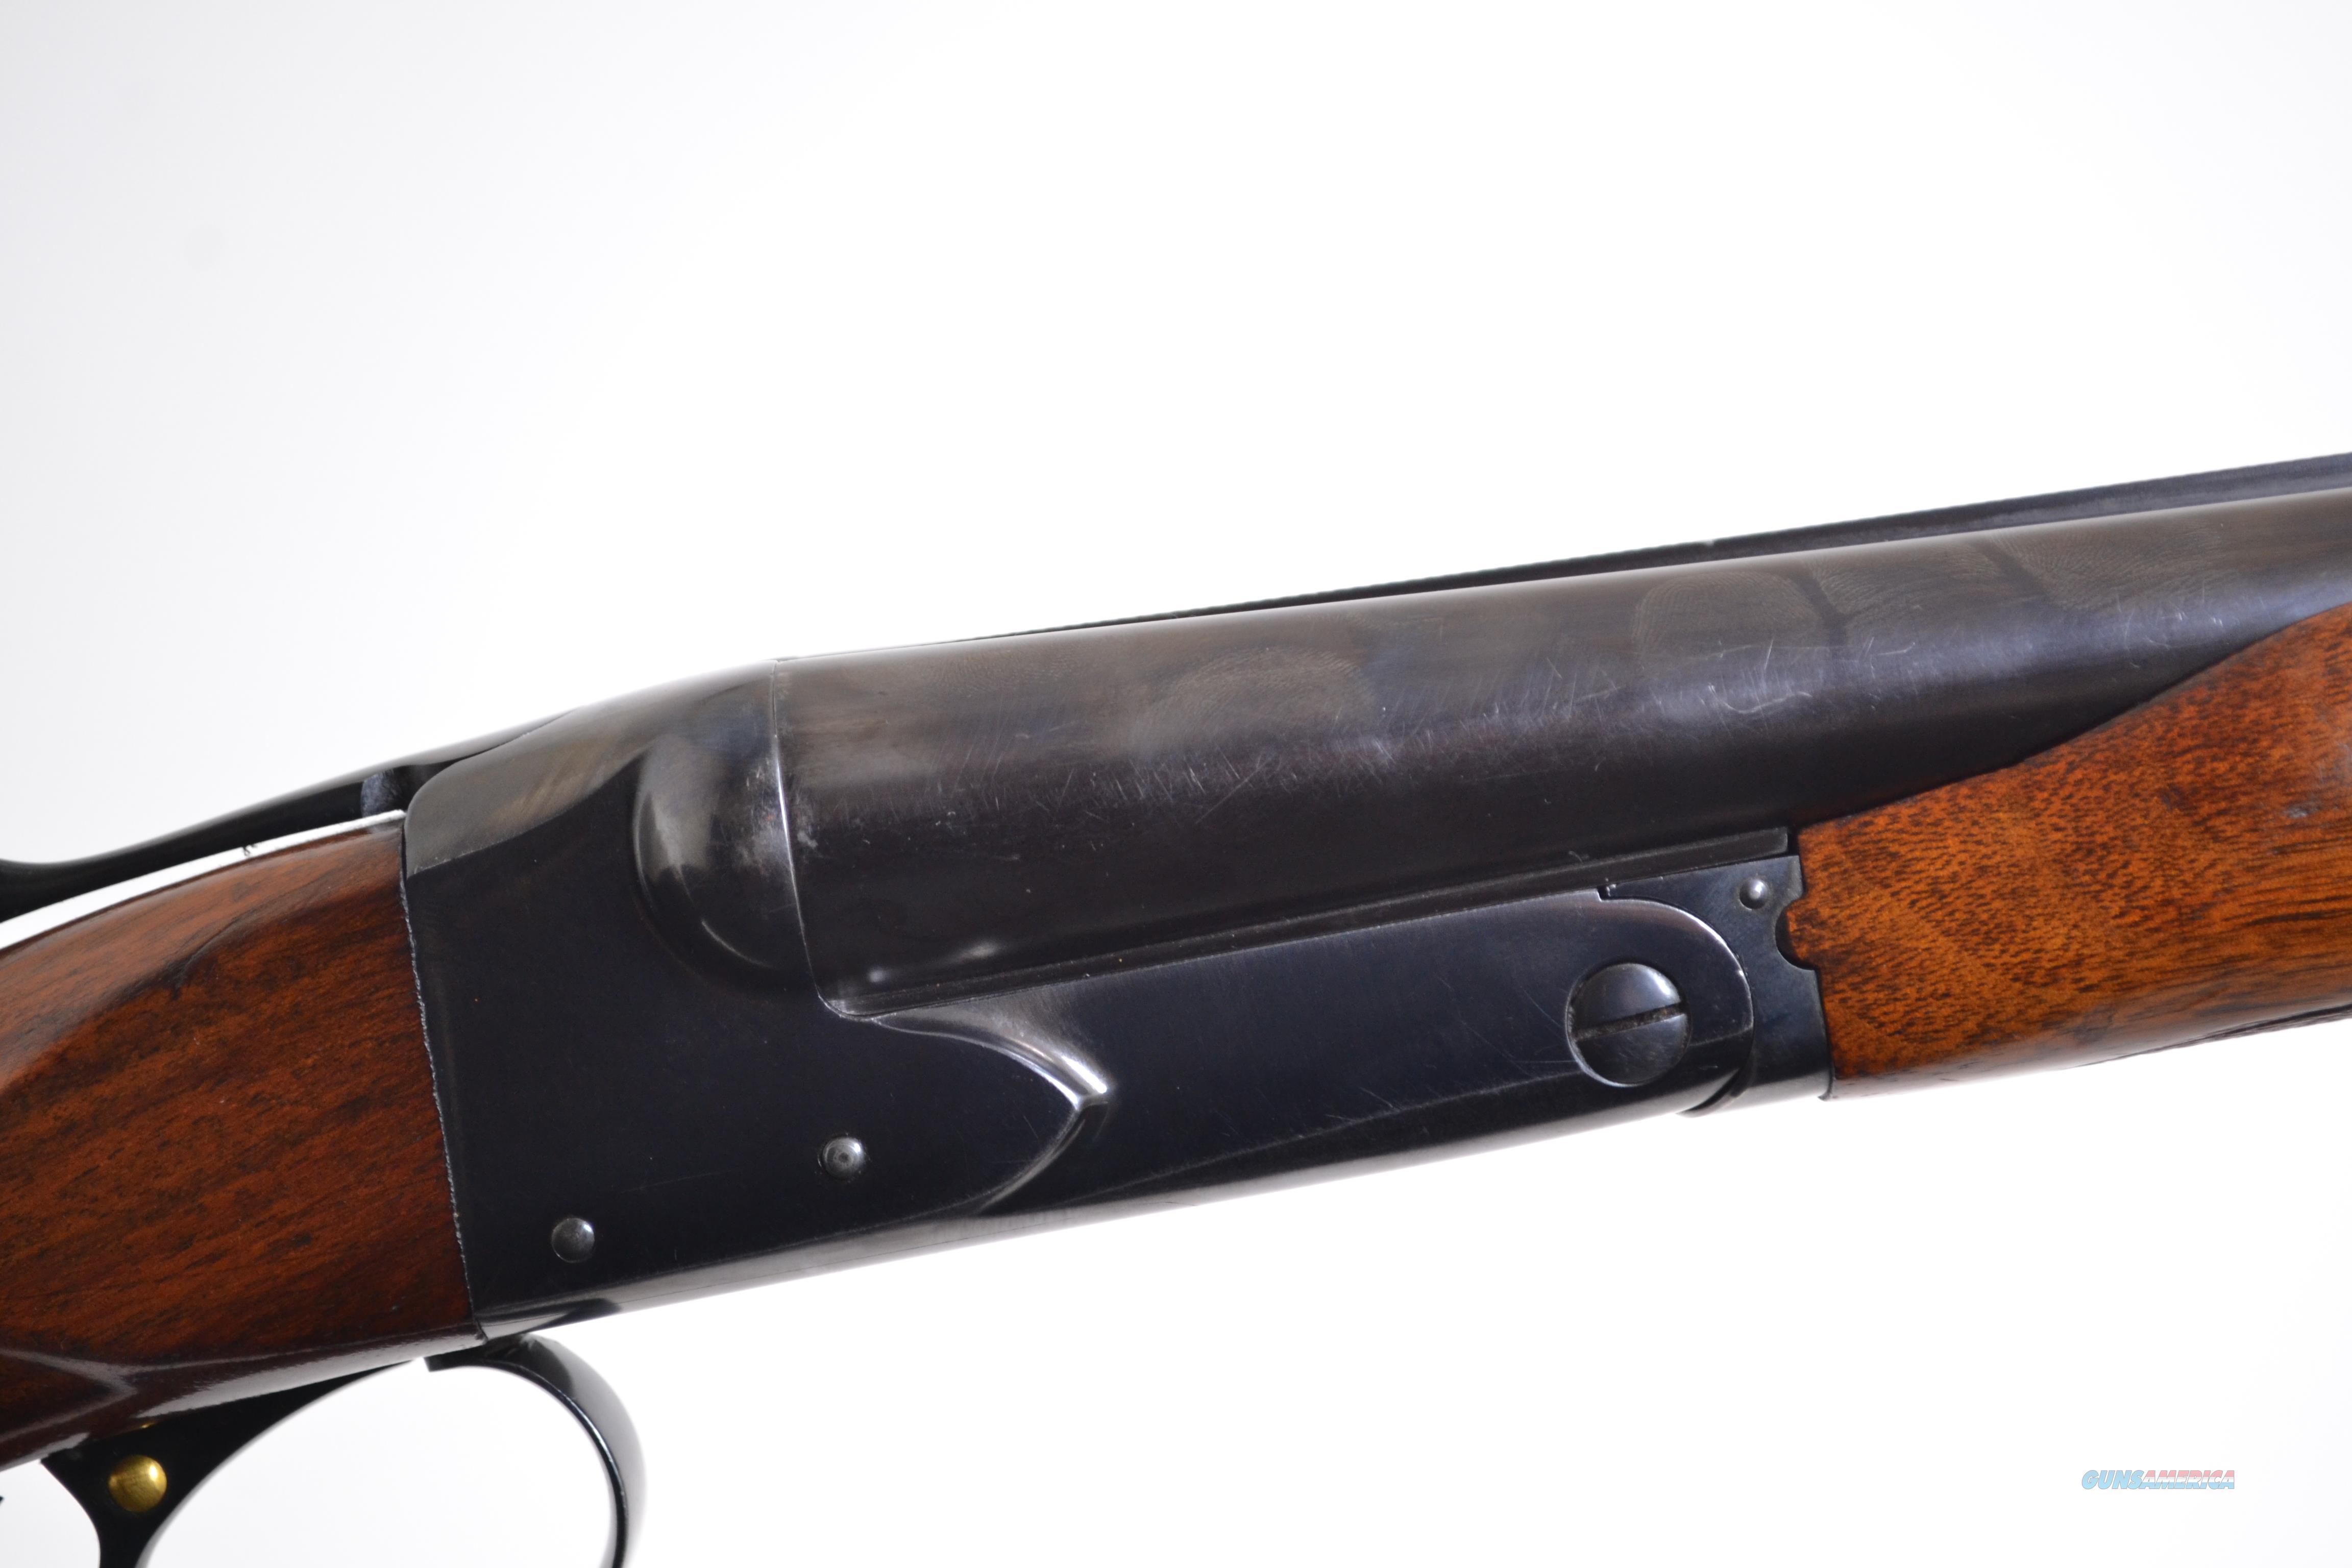 "Winchester - Model 21, Trap 12ga./12ga. 30"" Full/IM, 26"" IC/Mod  Guns > Shotguns > Winchester Shotguns - Modern > SxS"